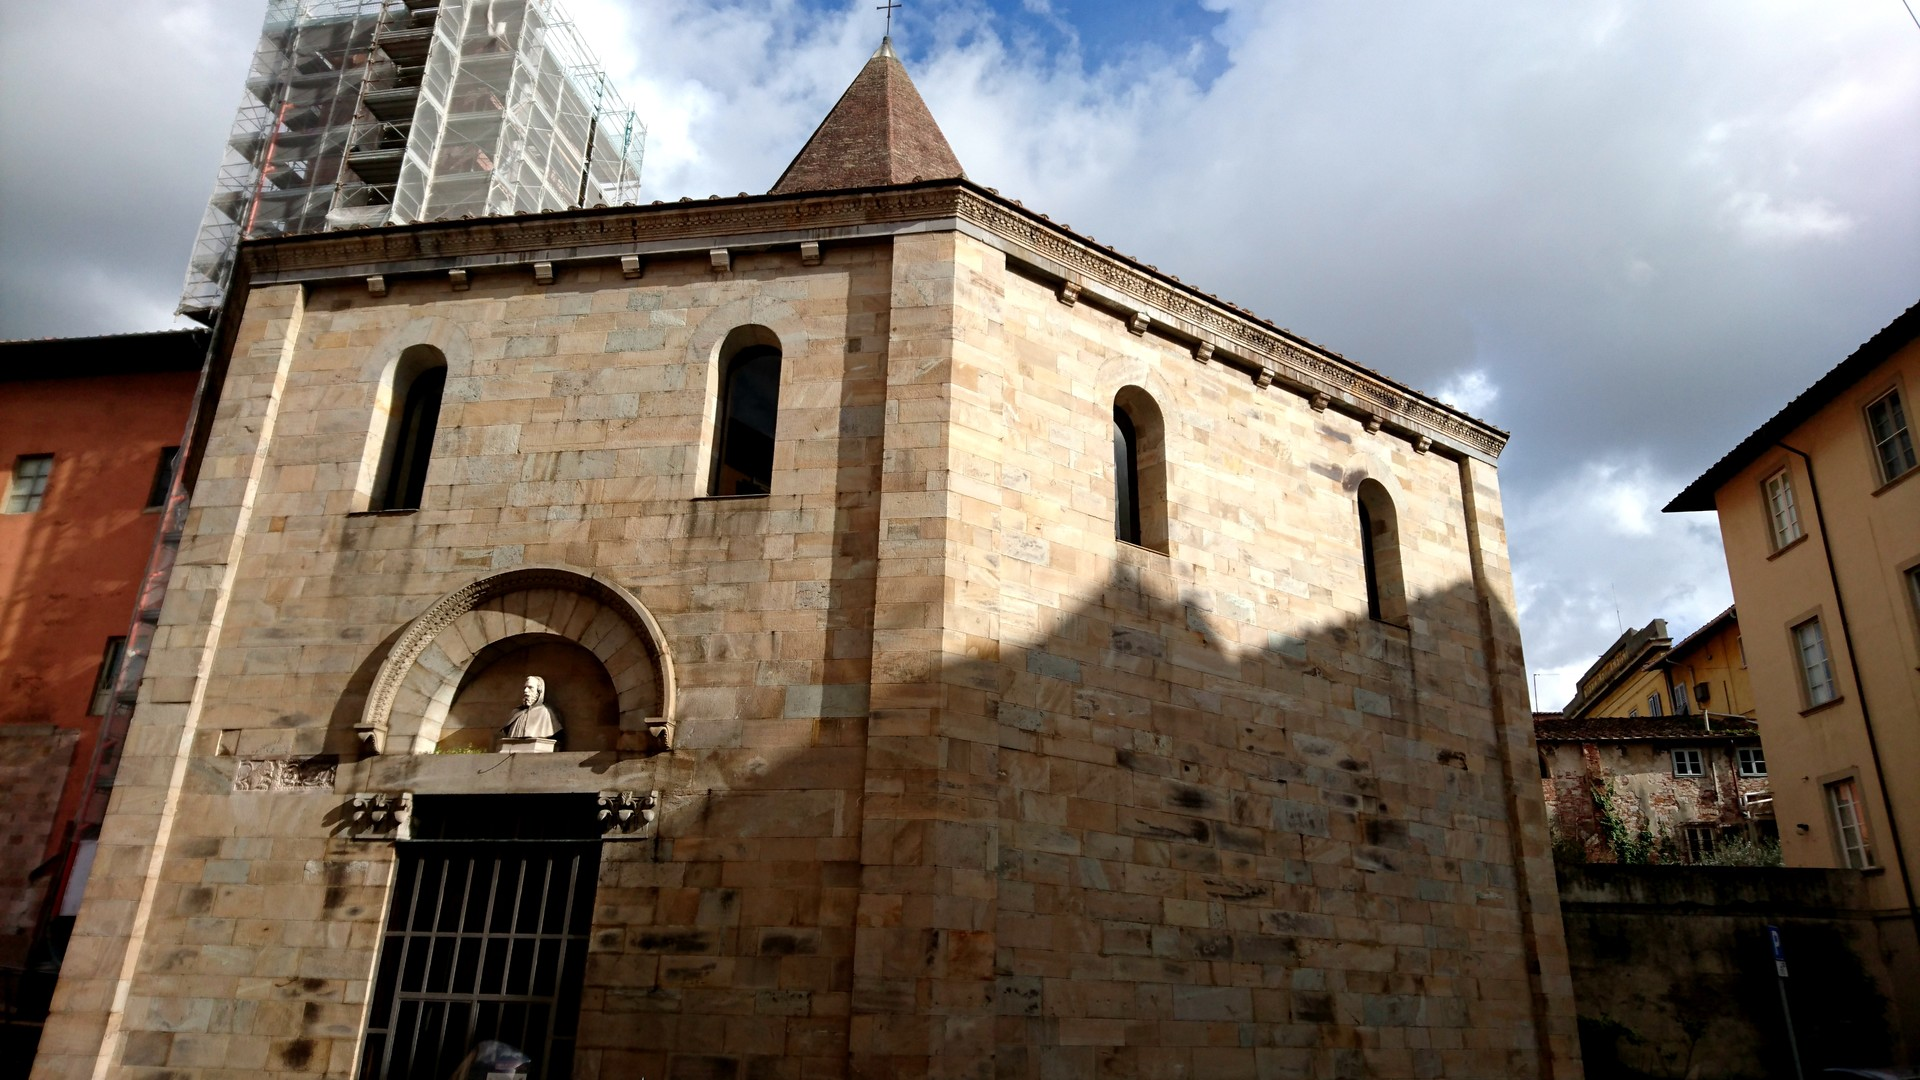 churches-and-their-beauty-f3098d0b90f5a8